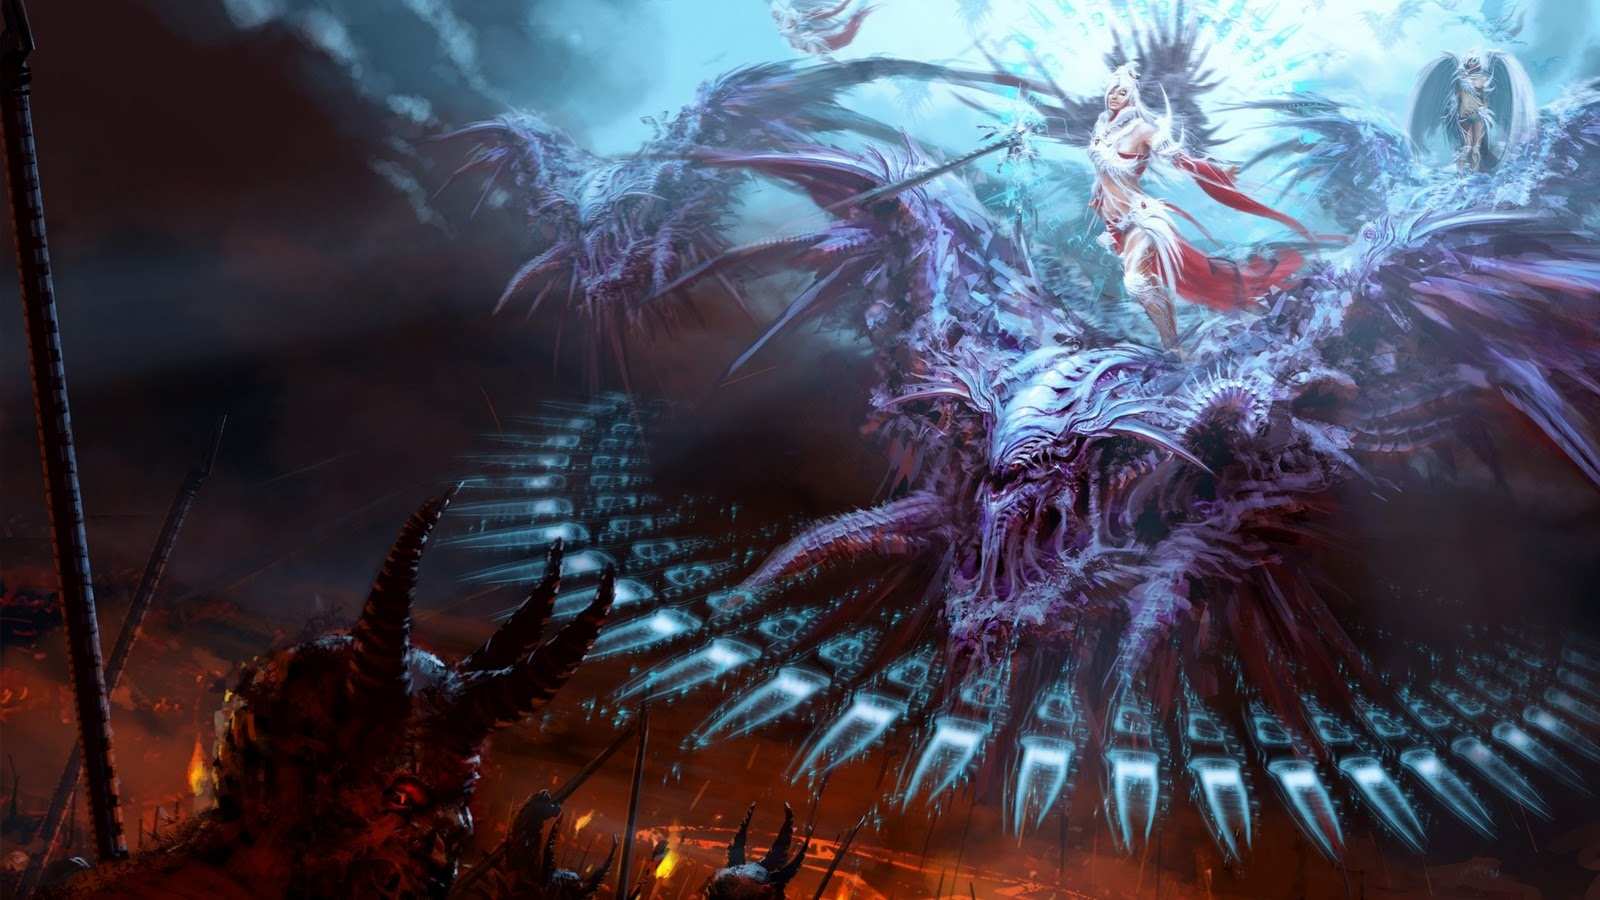 Vs Demons Amazing 3D Art HD Wallpapers Epic Desktop Backgrounds 1600x900